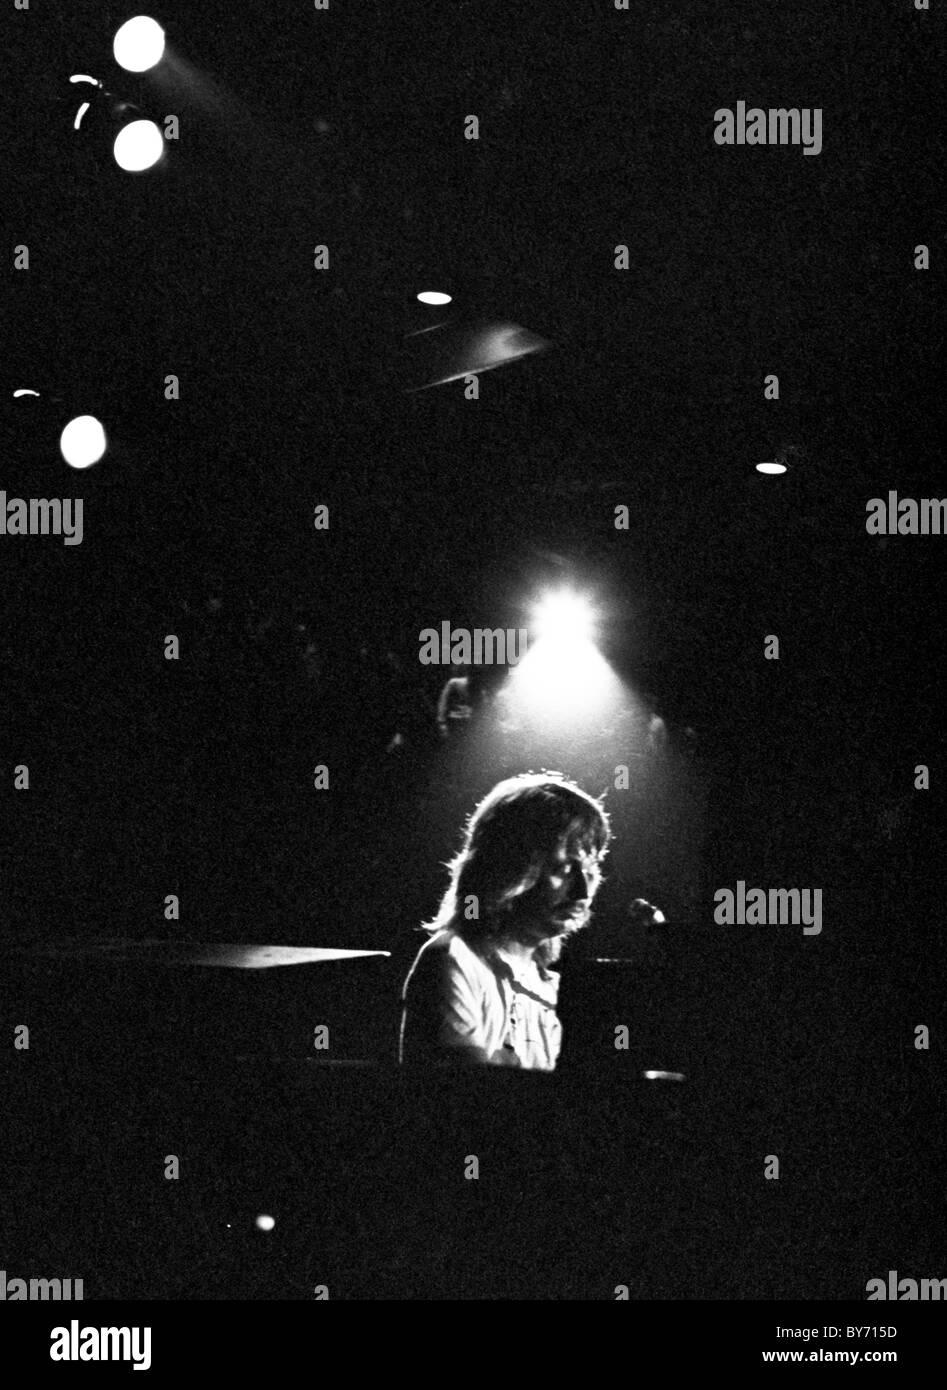 Leon Russel play Duke University, Durham, North Carolina, 1971 Leon Russell - Stock Image